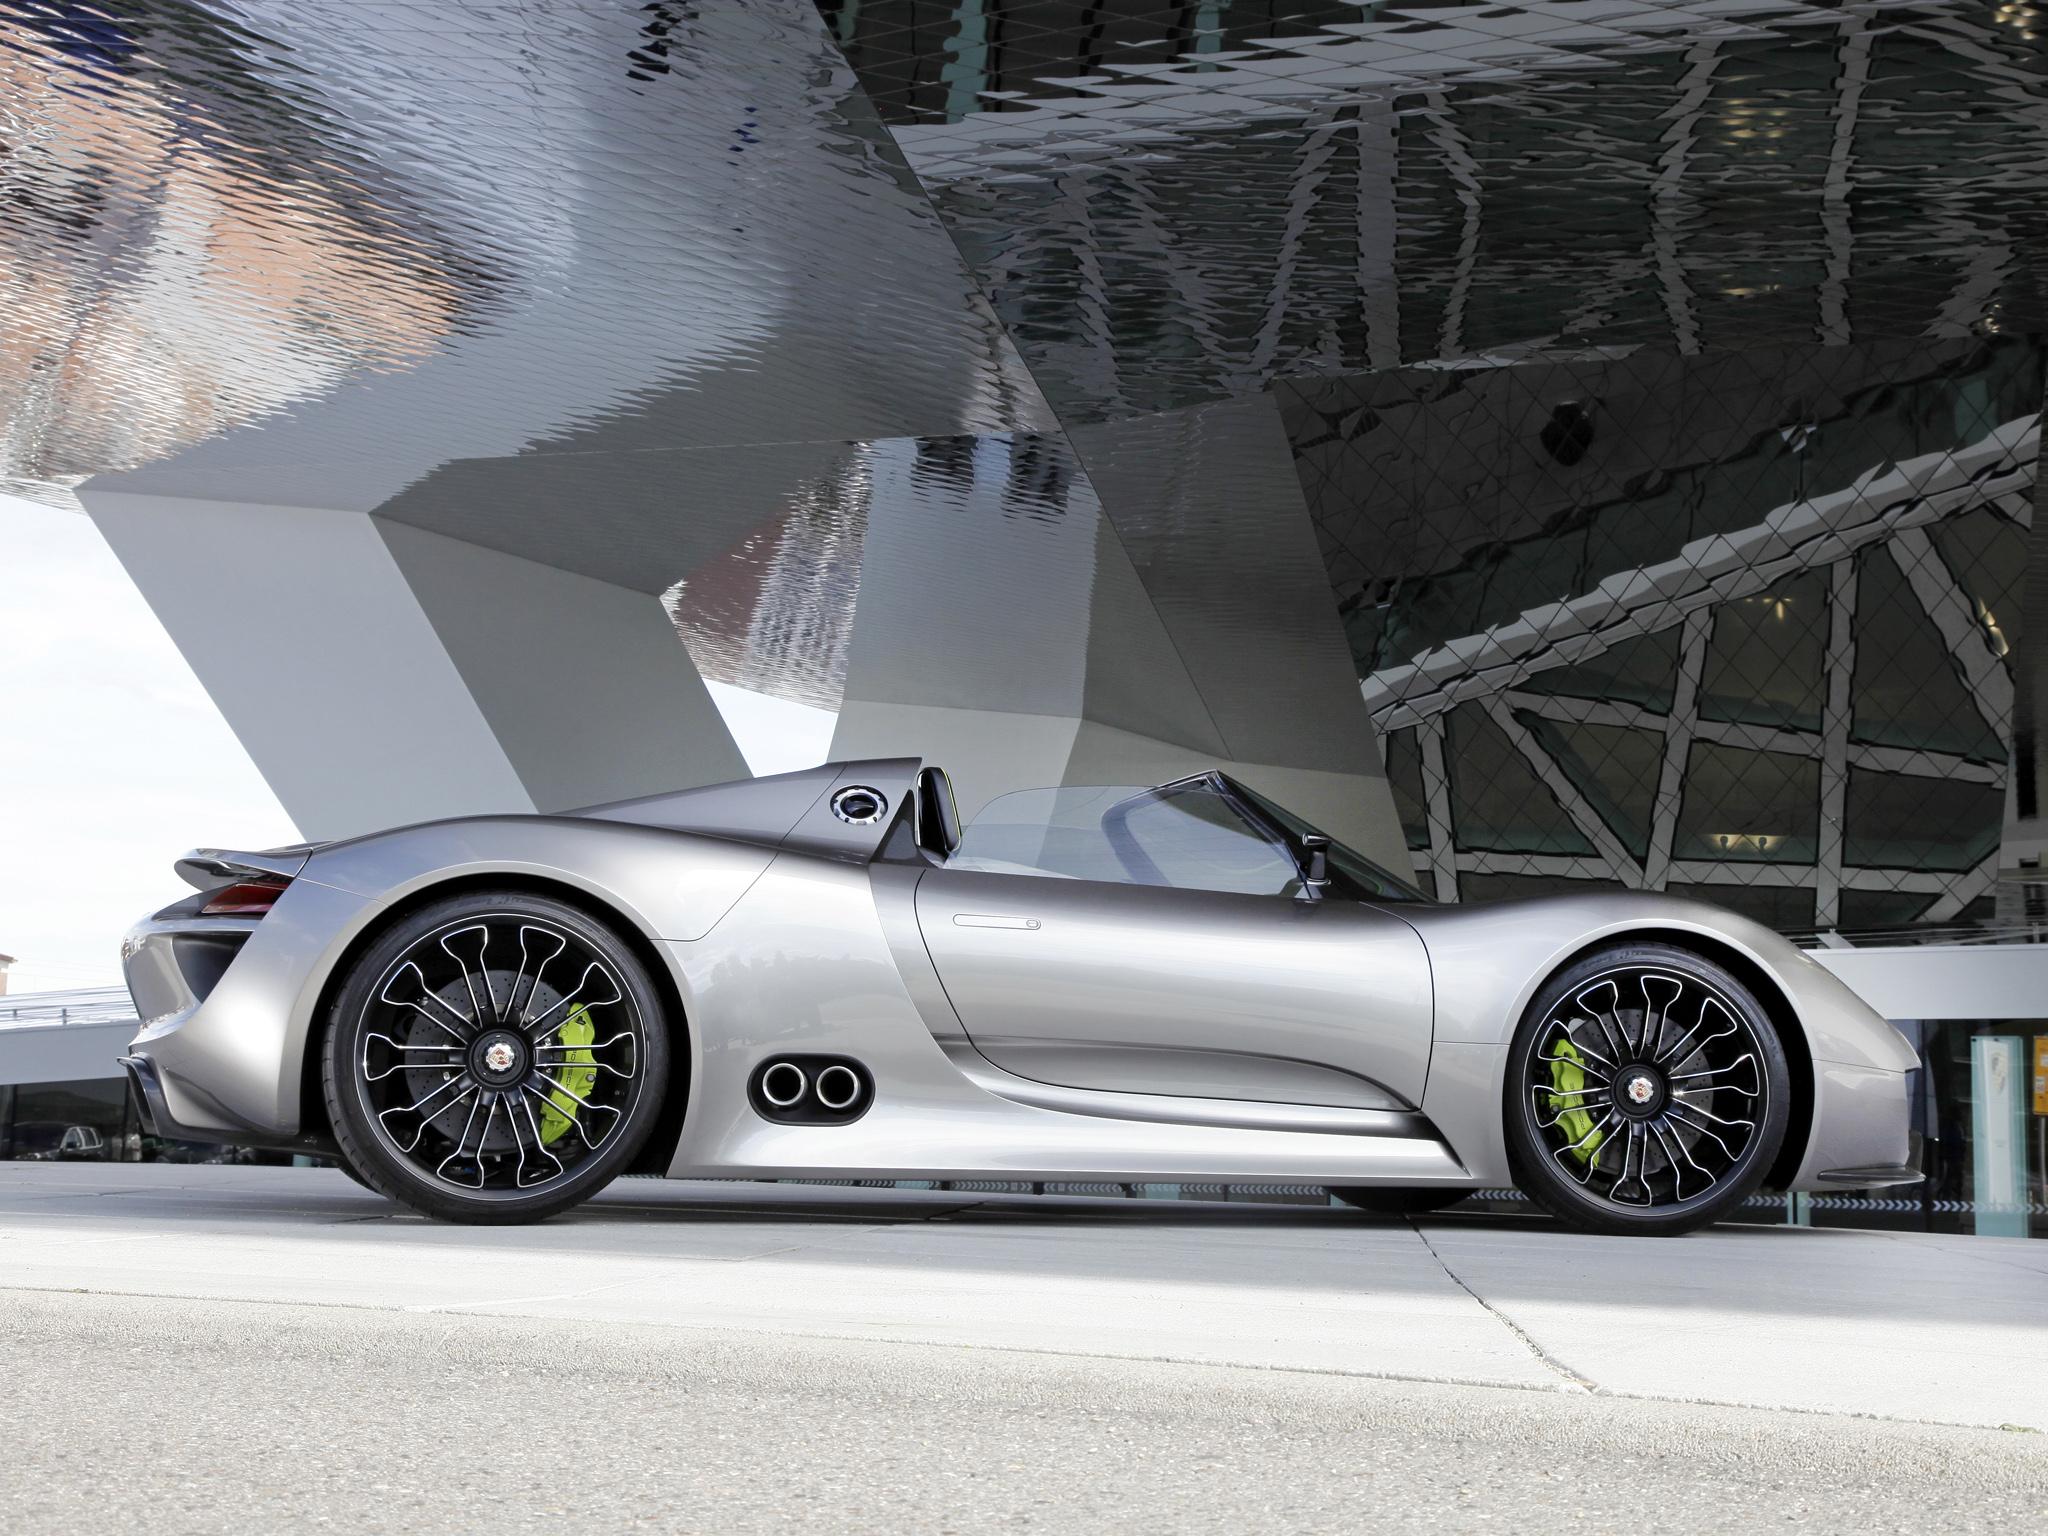 2010 porsche 918 spyder concept supercar supercars h. Black Bedroom Furniture Sets. Home Design Ideas